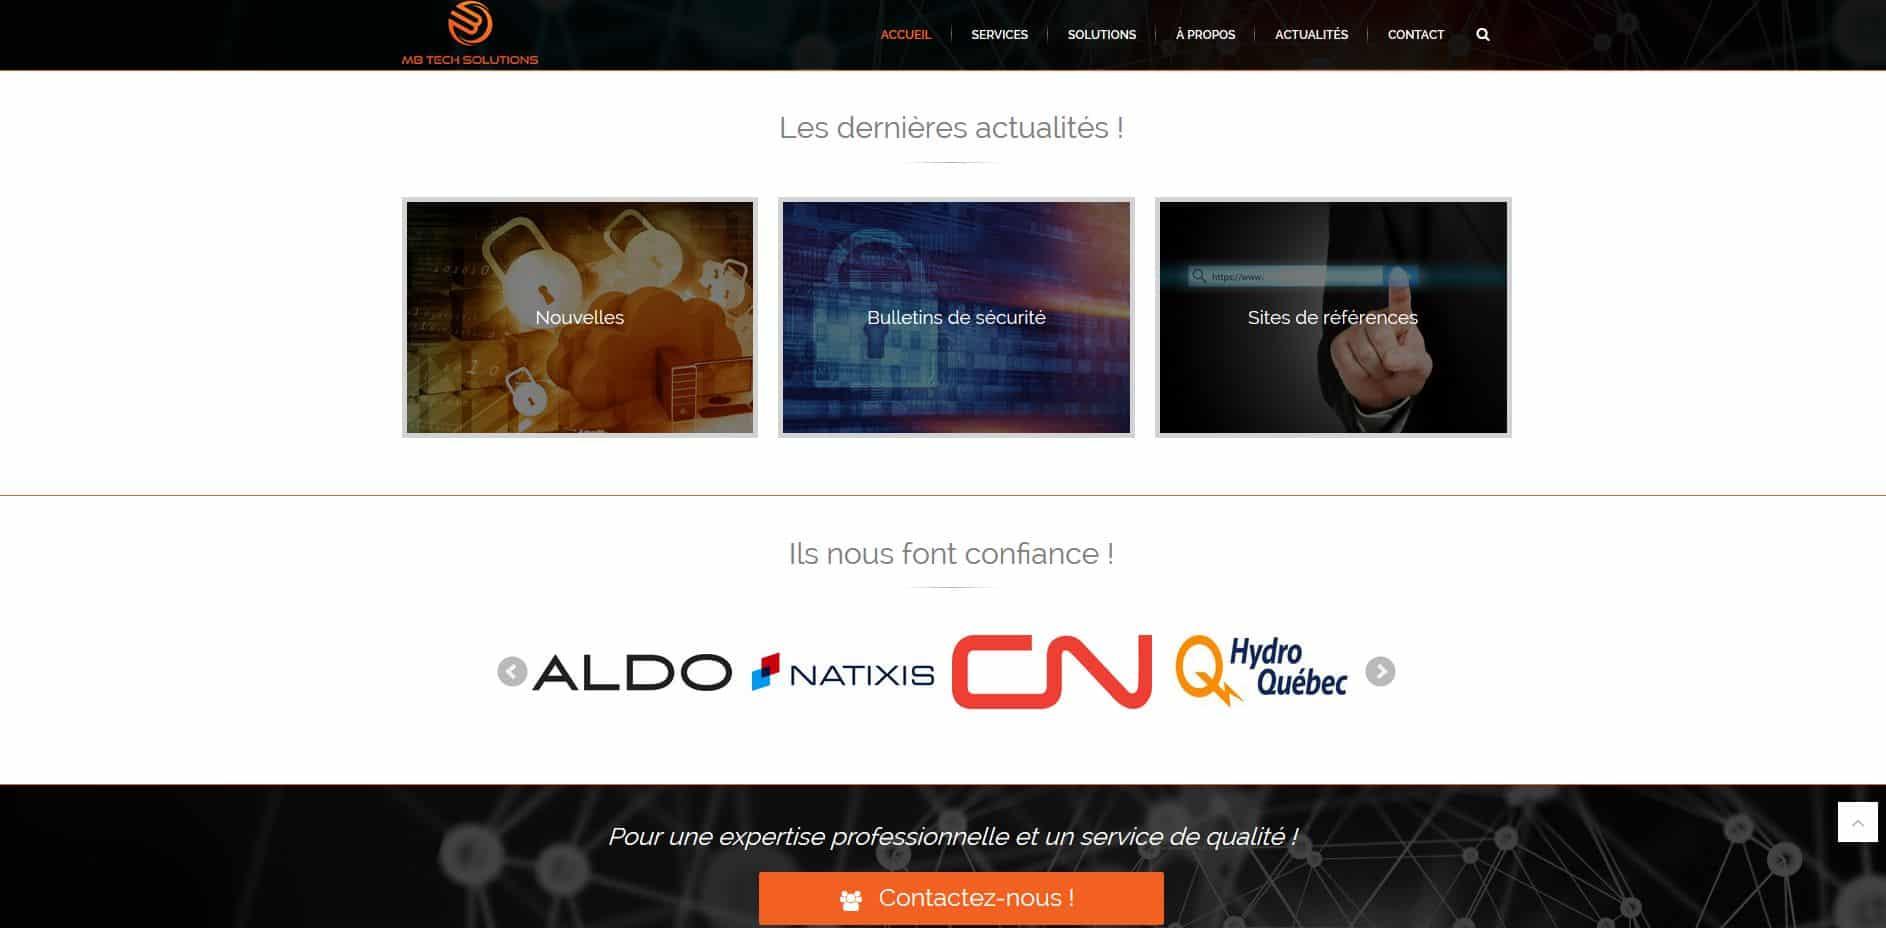 conception-web-mb-tech-solutions-6.jpg